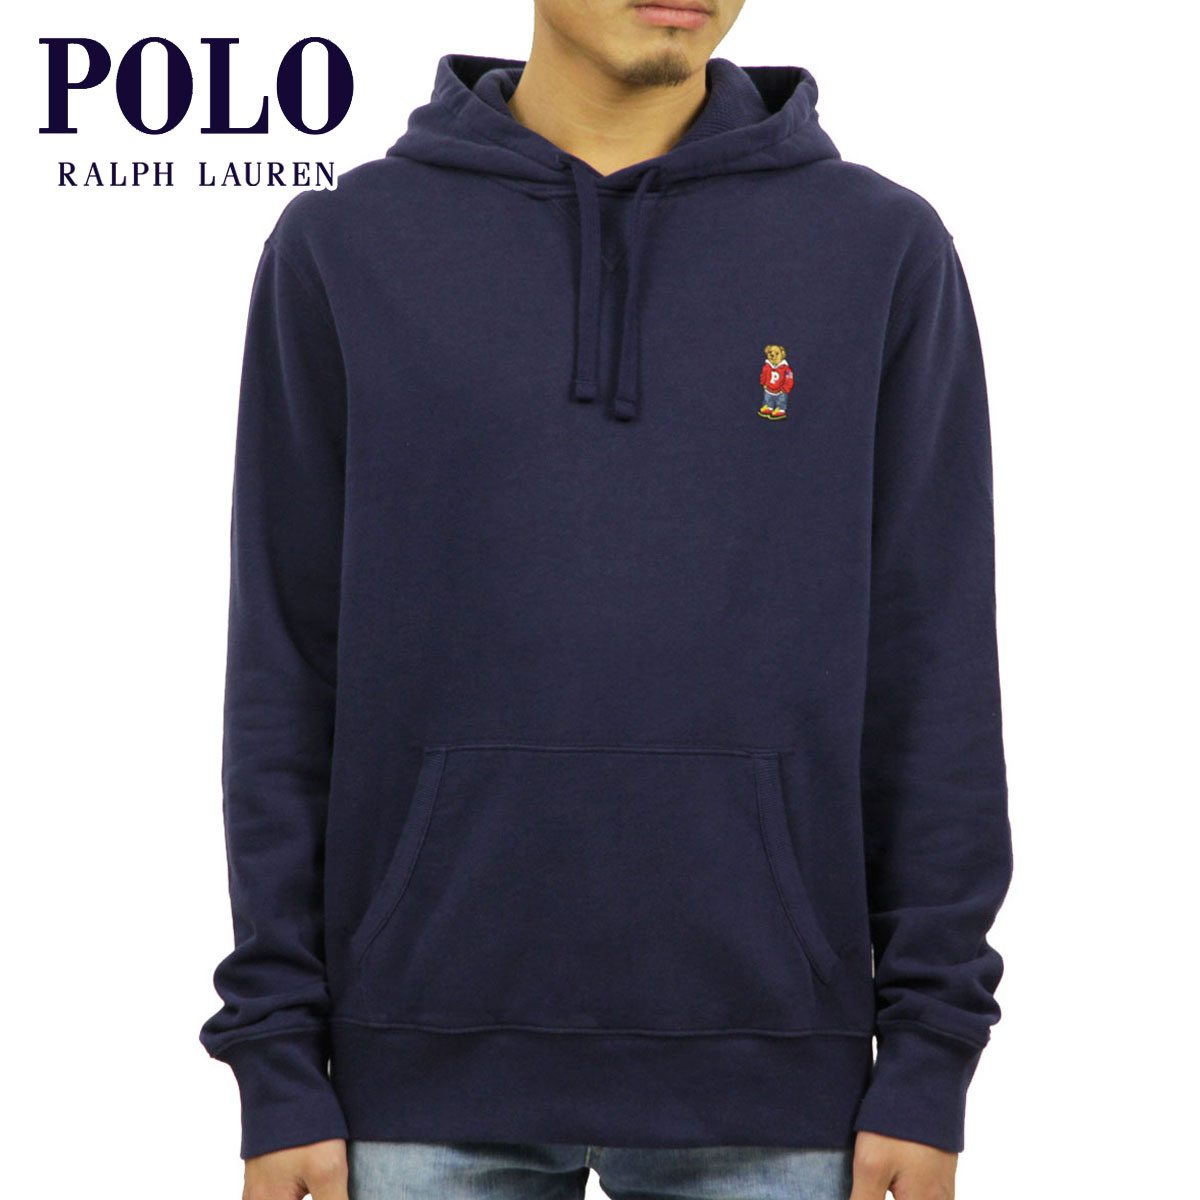 0493763c5 Polo Ralph Lauren POLO RALPH LAUREN regular article men pullover parka POLO  BEAR FLEECE HOODIE ...